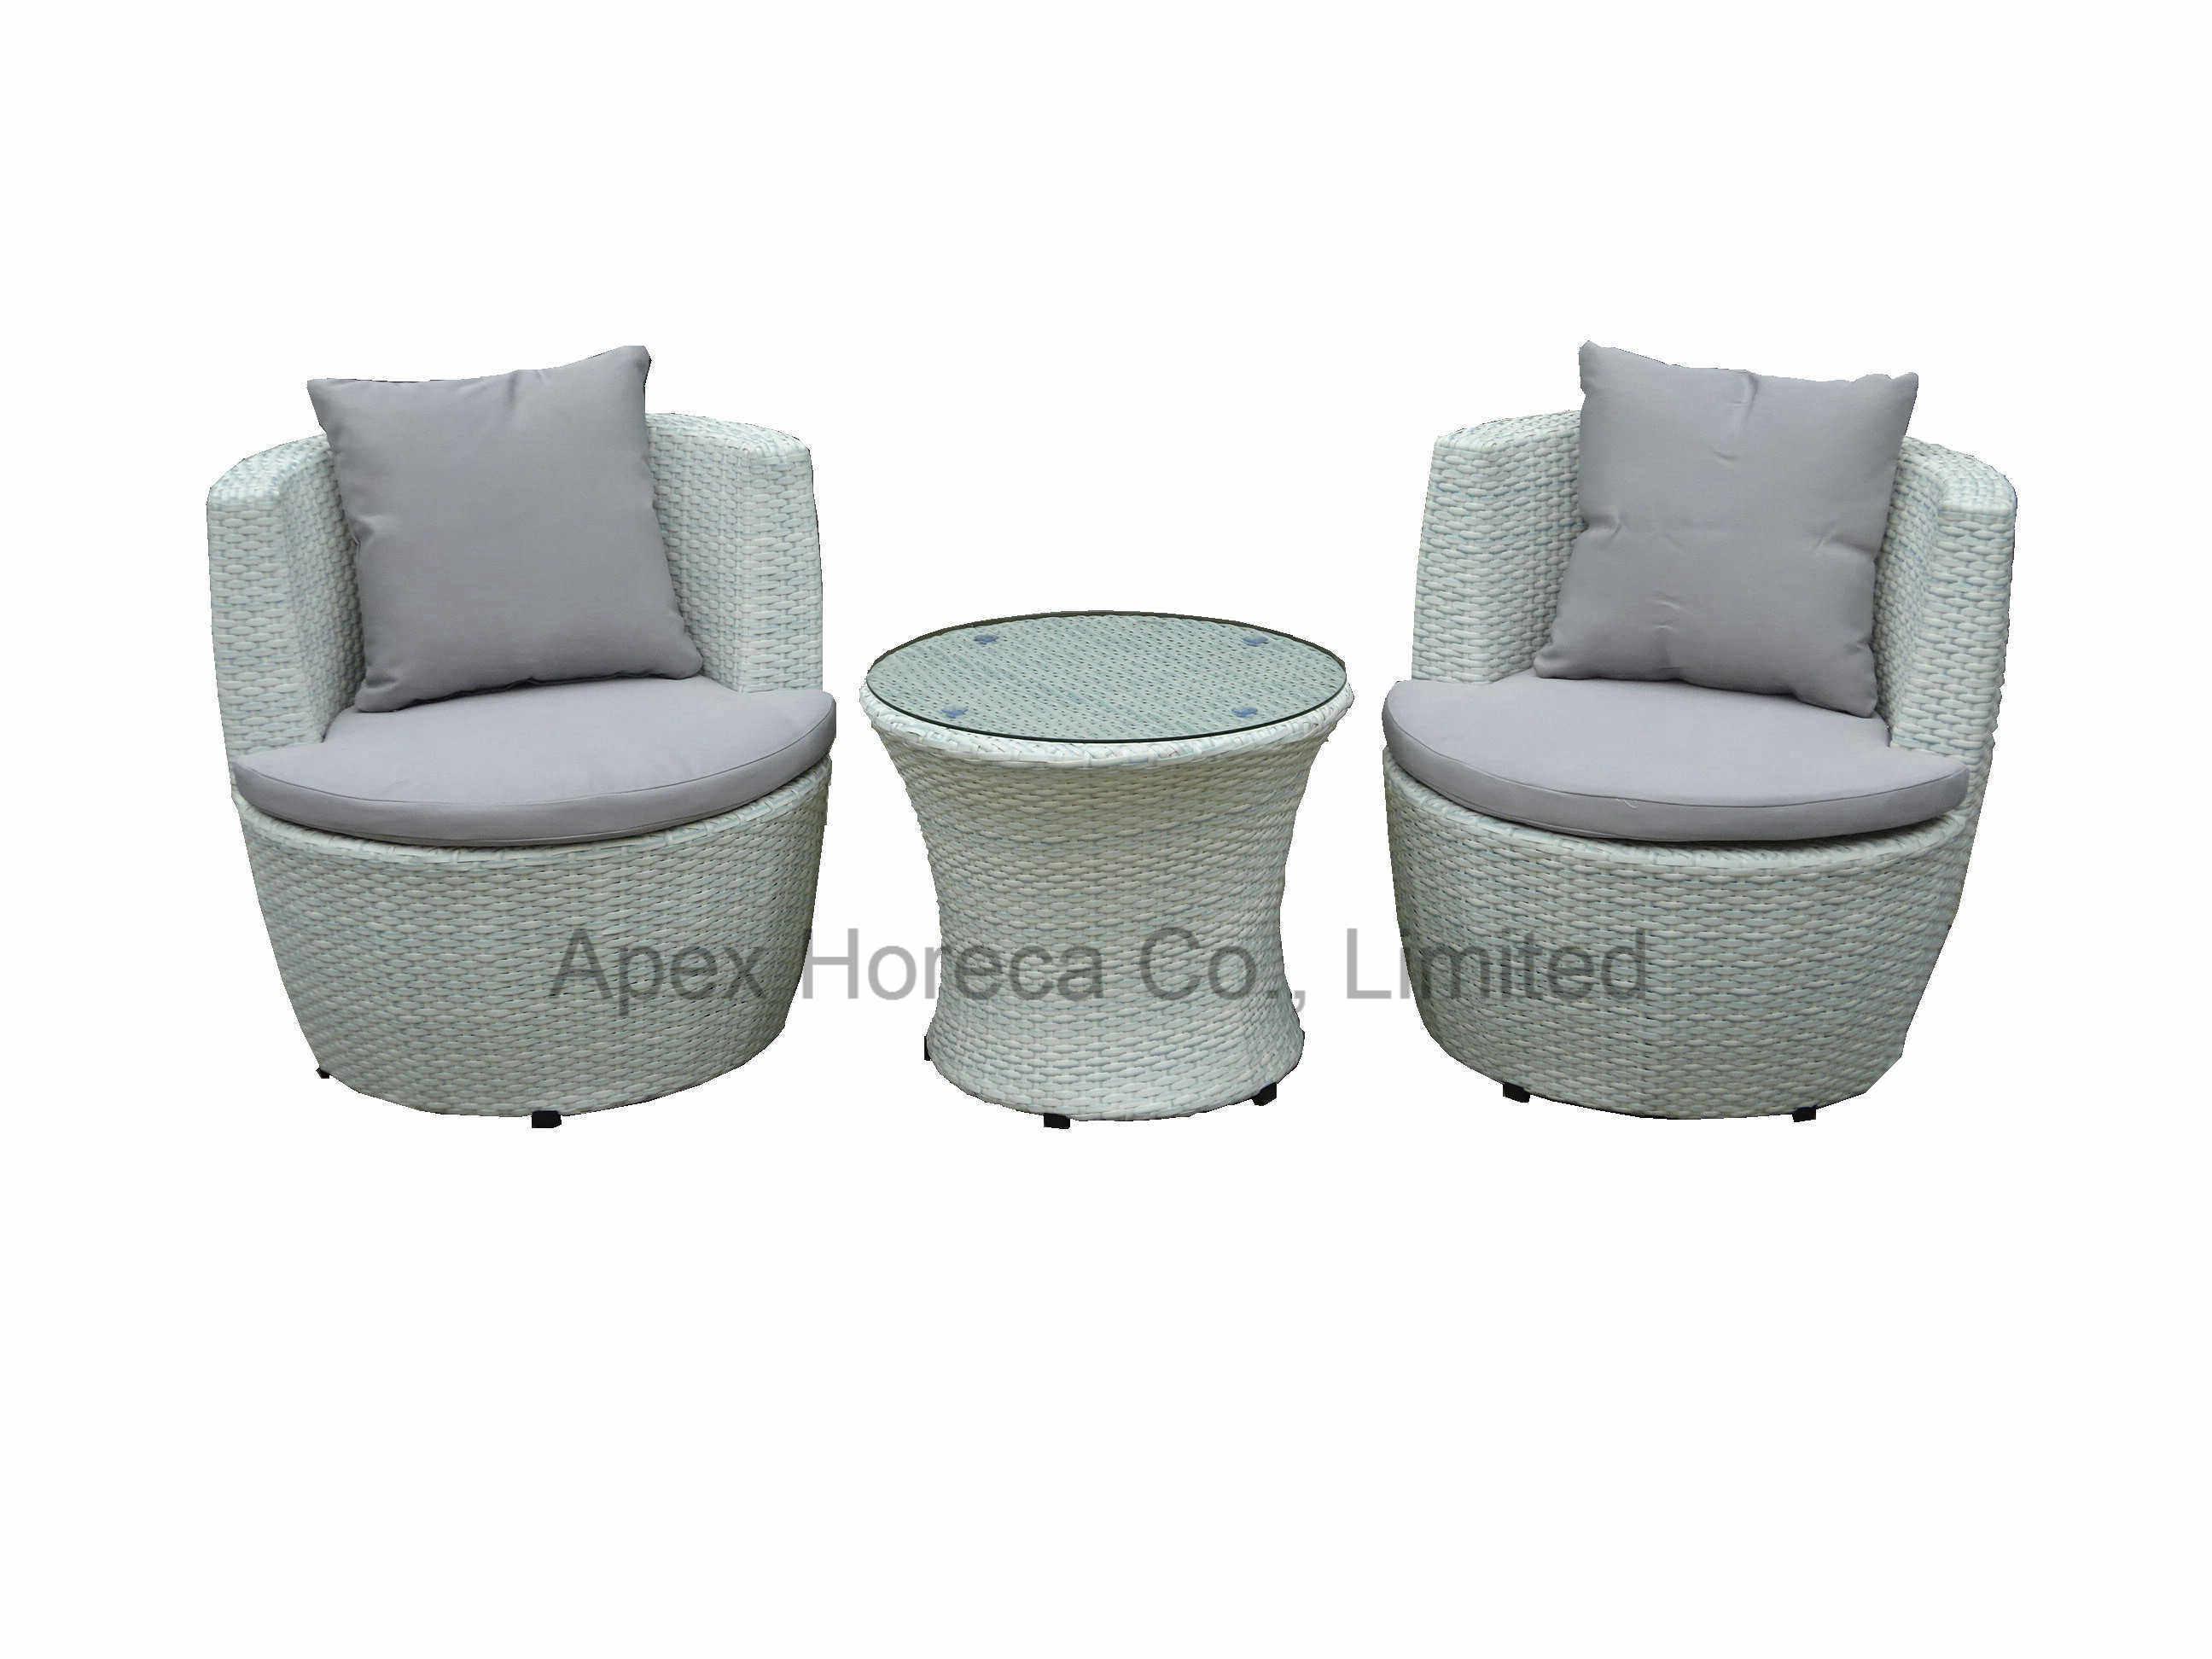 Balcony Wicker Sofa Set Outdoor Furniture Rattan Garden Furniture Lounge Sofa